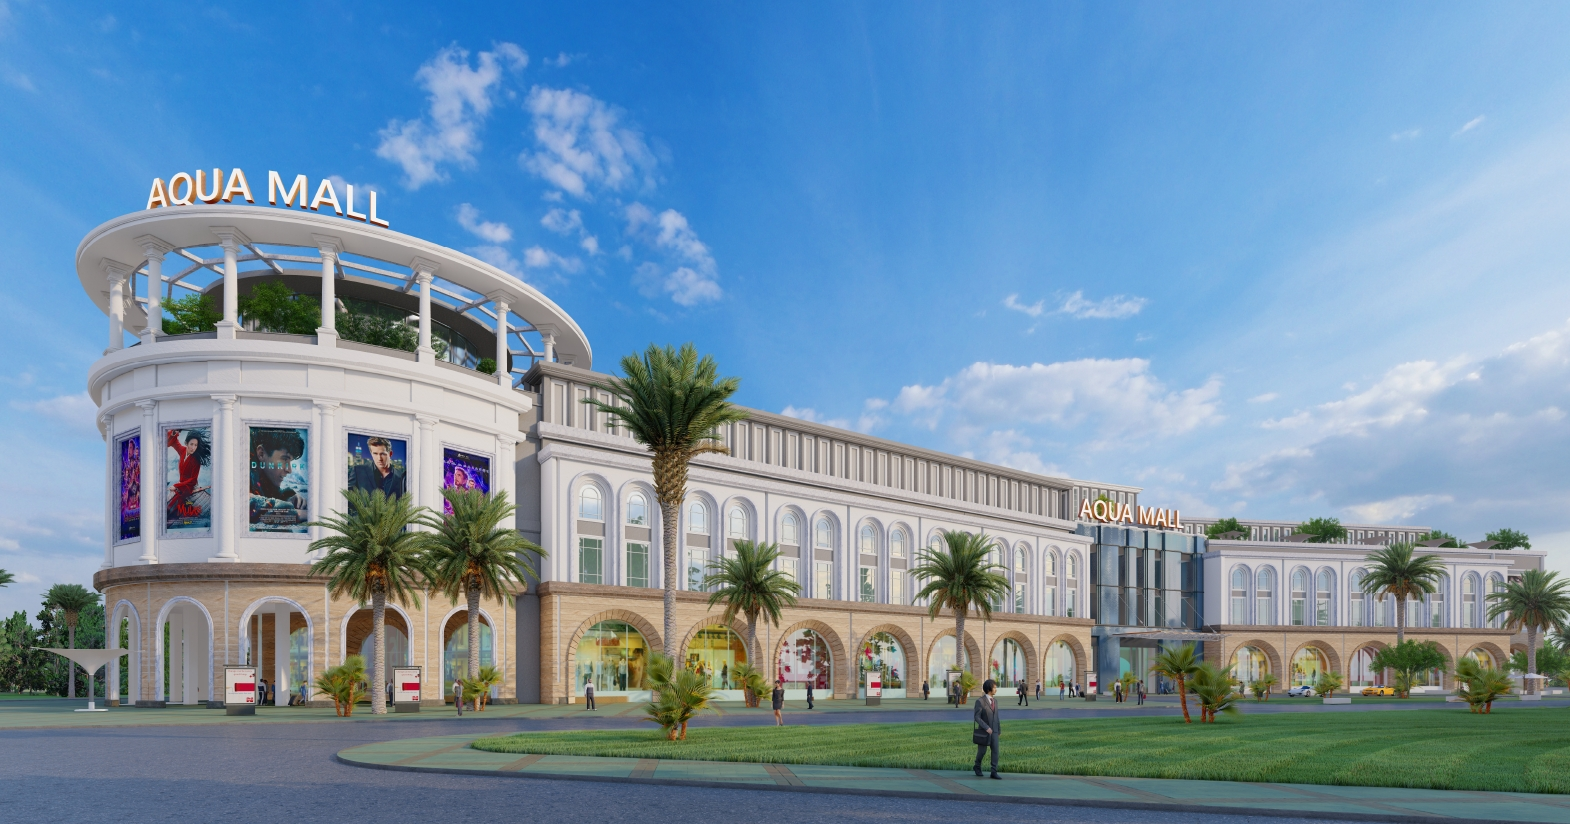 Aqua Central Mall rộng 10 hecta